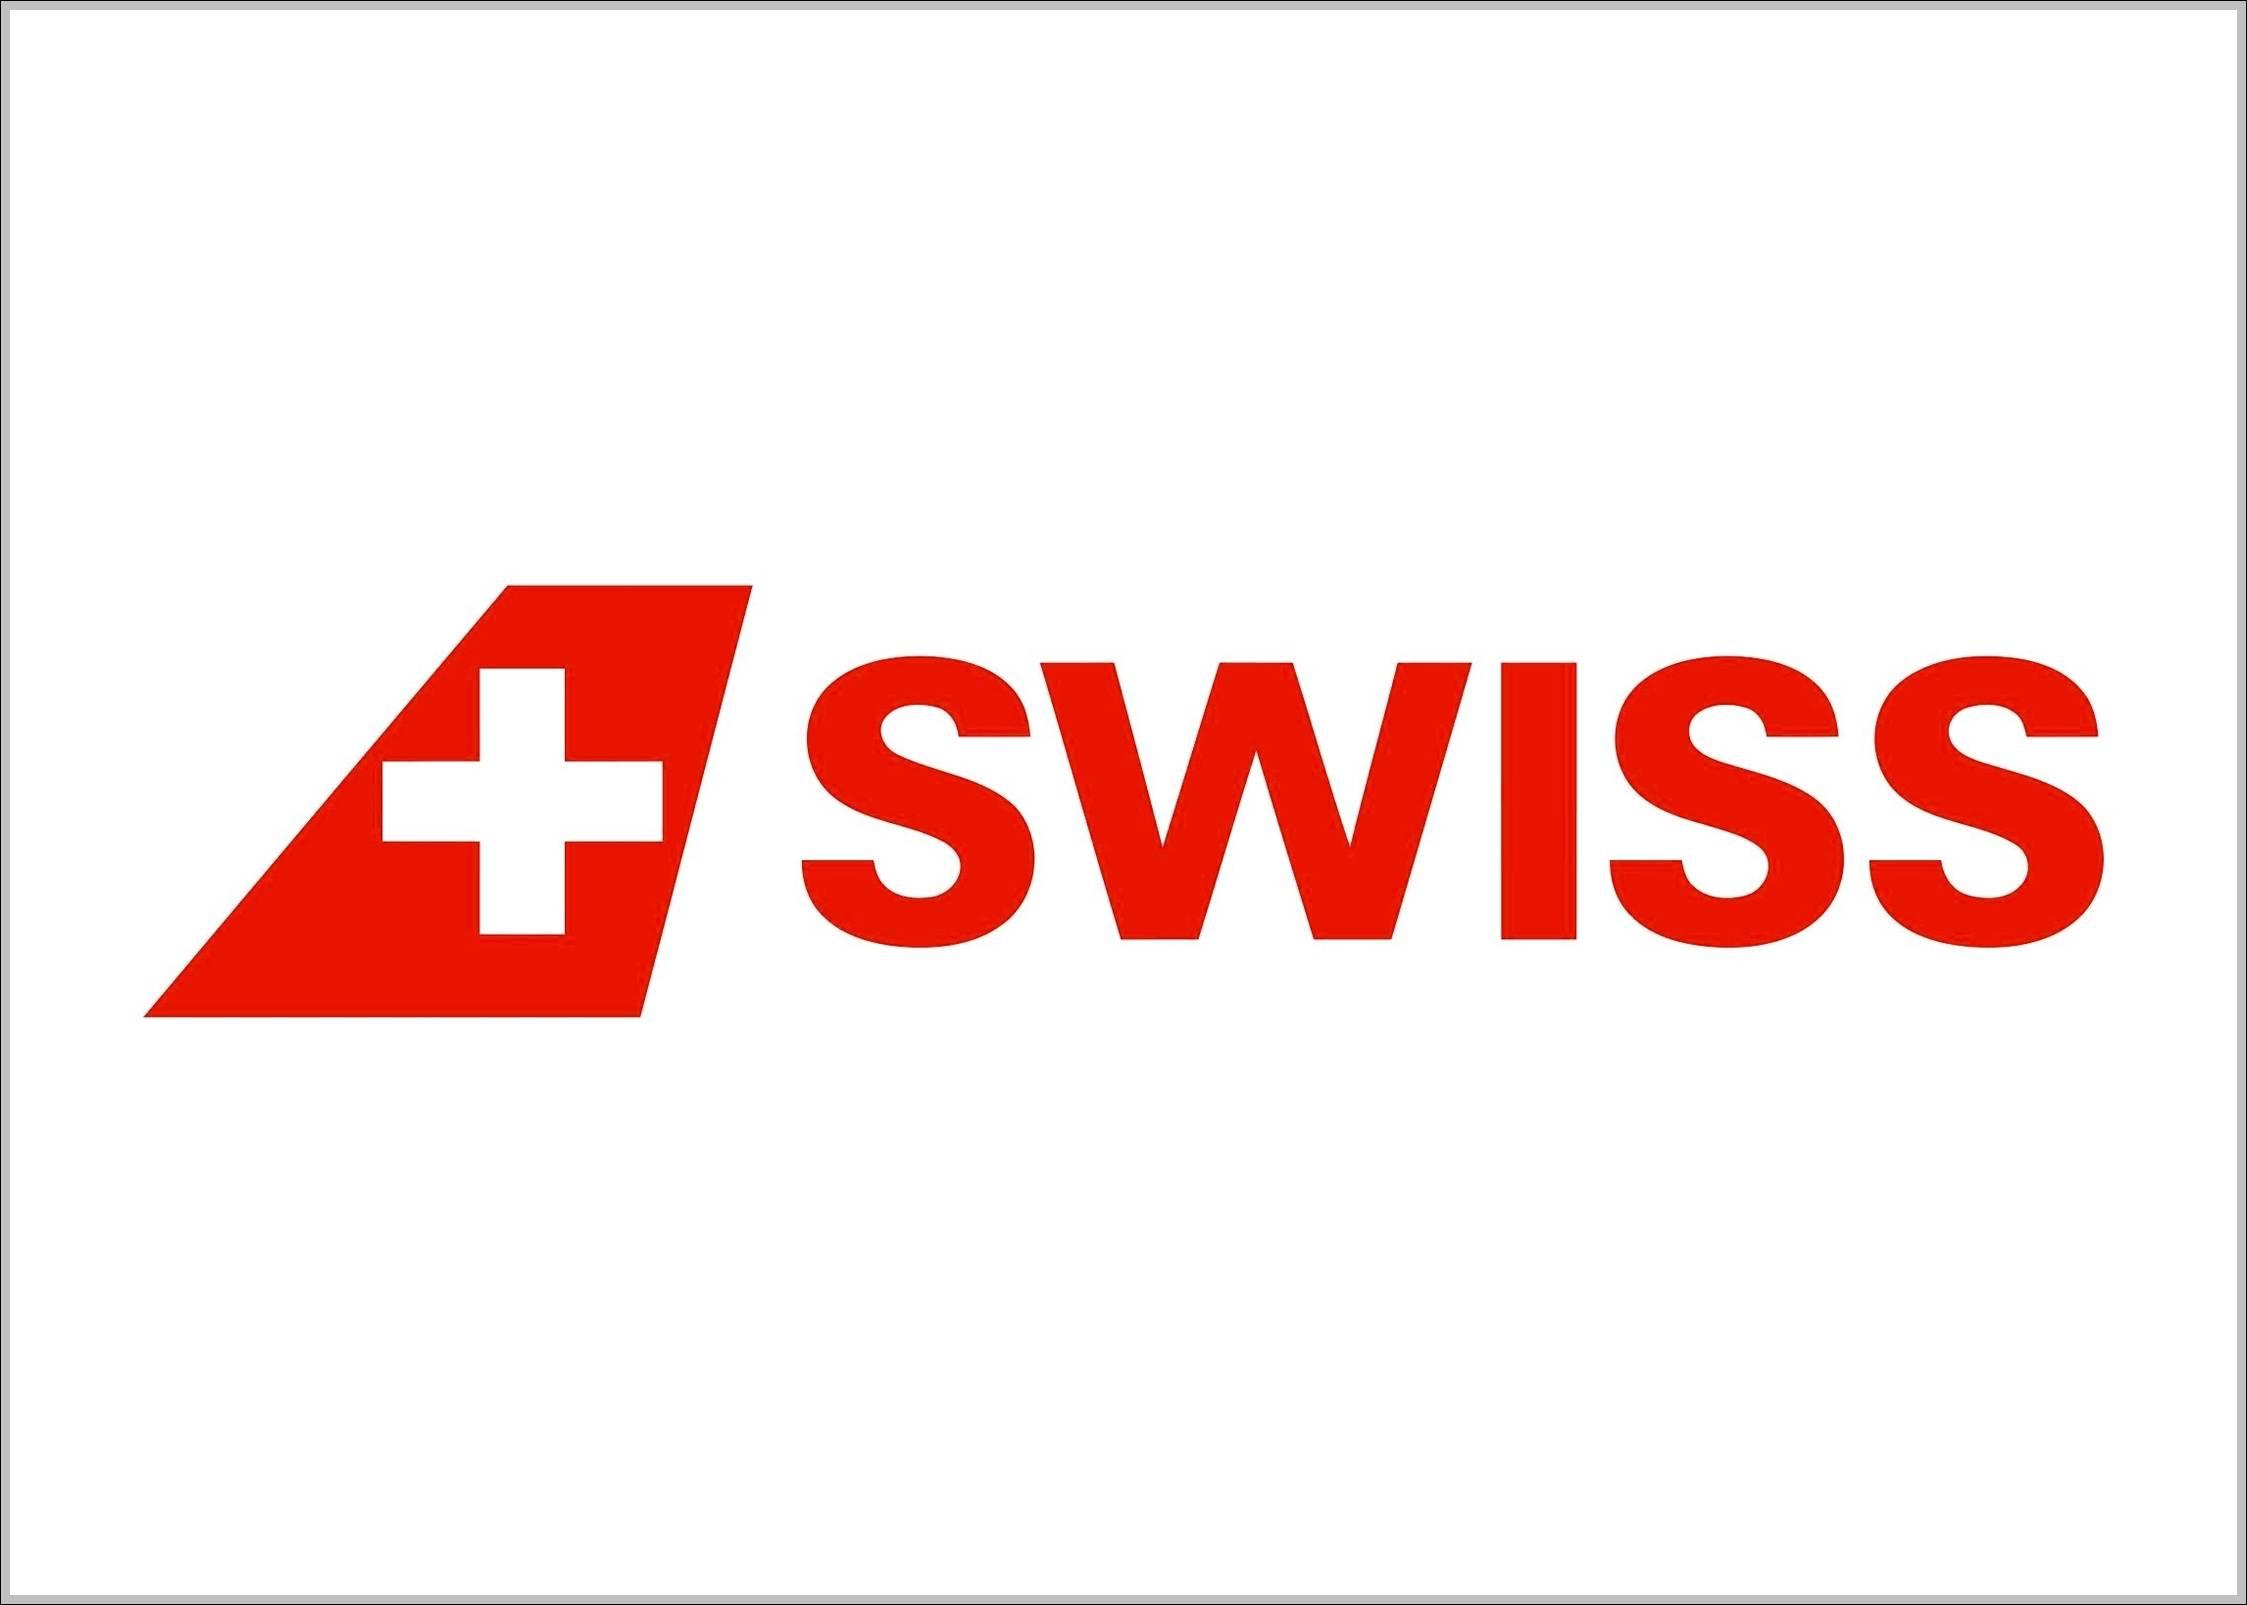 Symbol logo sign logos signs symbols trademarks of swiss international air lines logo buycottarizona Image collections